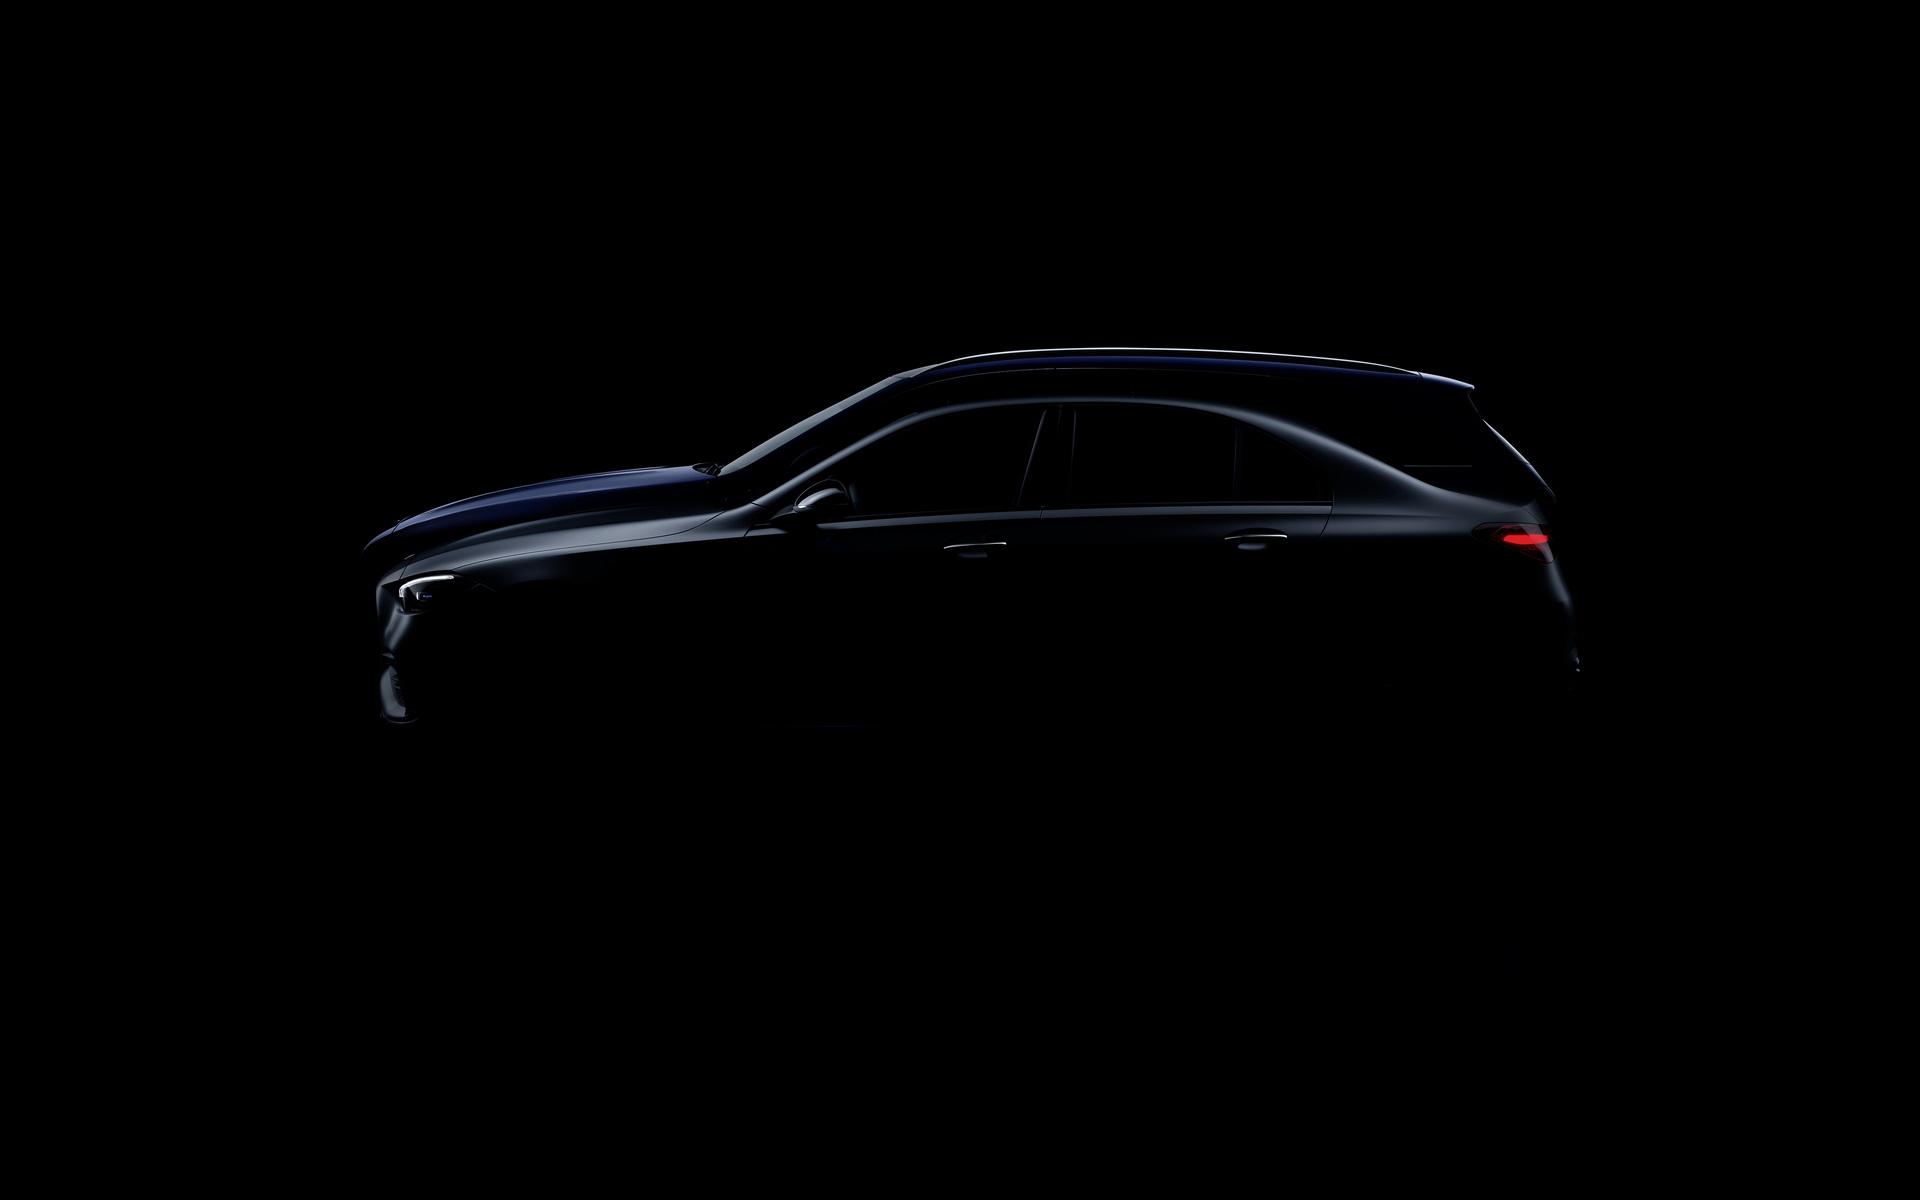 Mercedes-Benz Classe C teaser